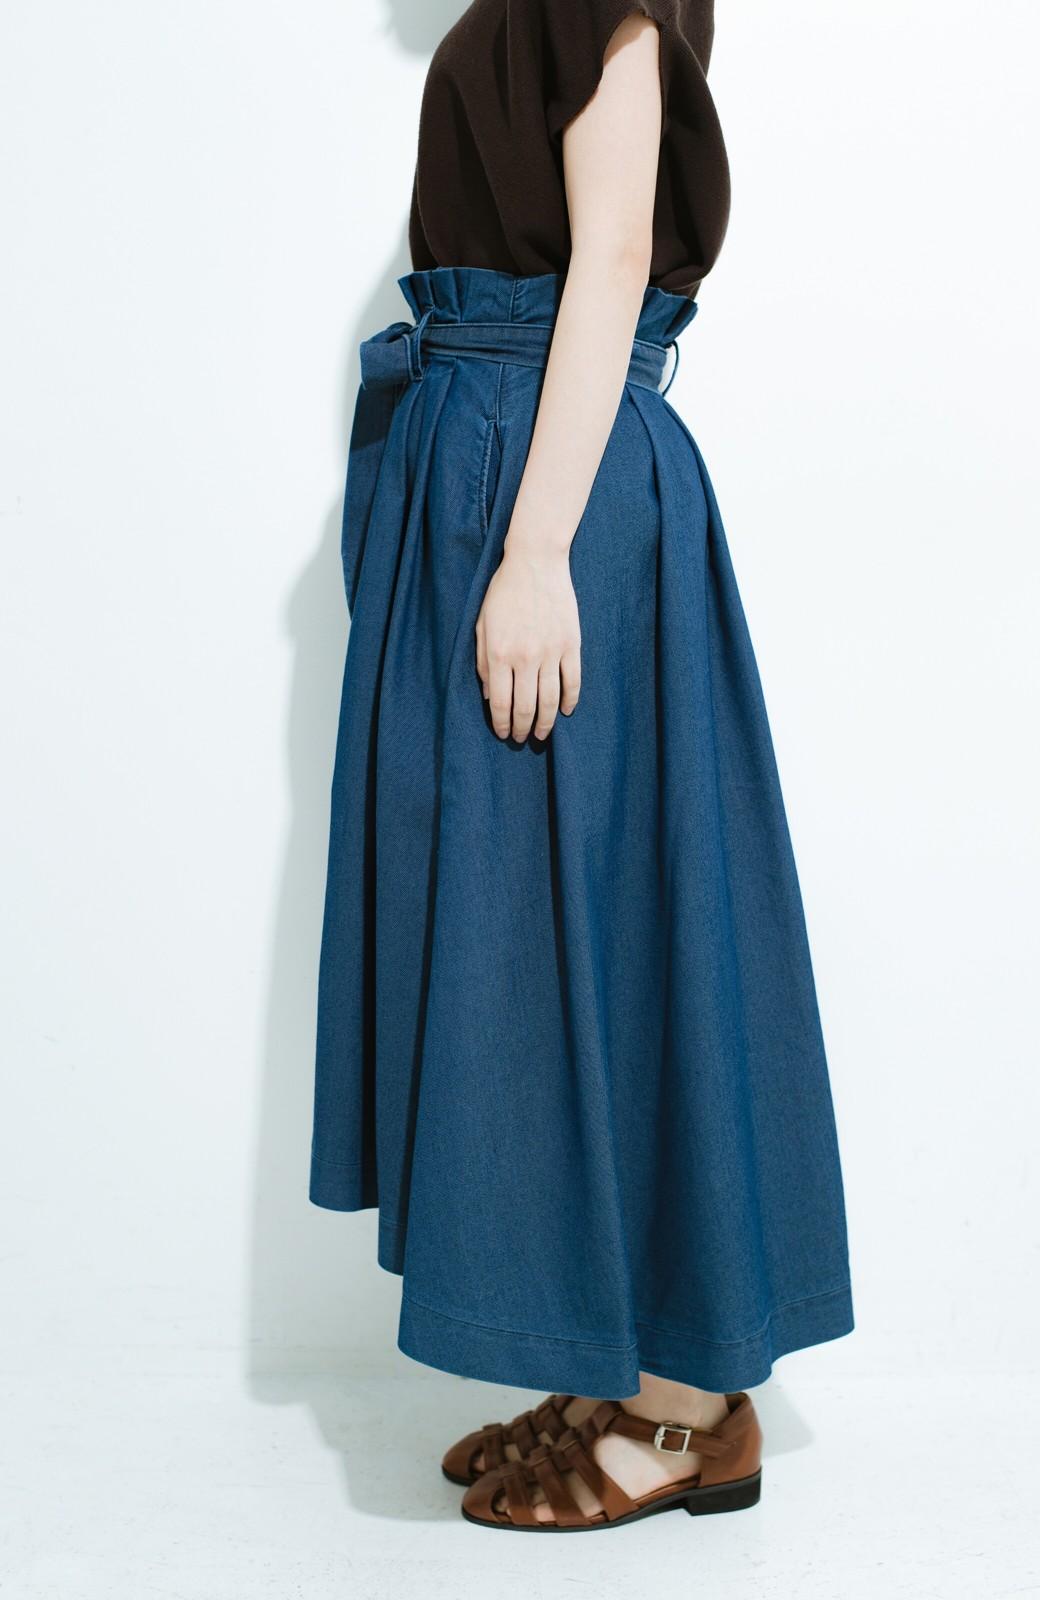 haco! Lady Lee ウエストリボンのペーパーバッグスカート <ブルー>の商品写真3